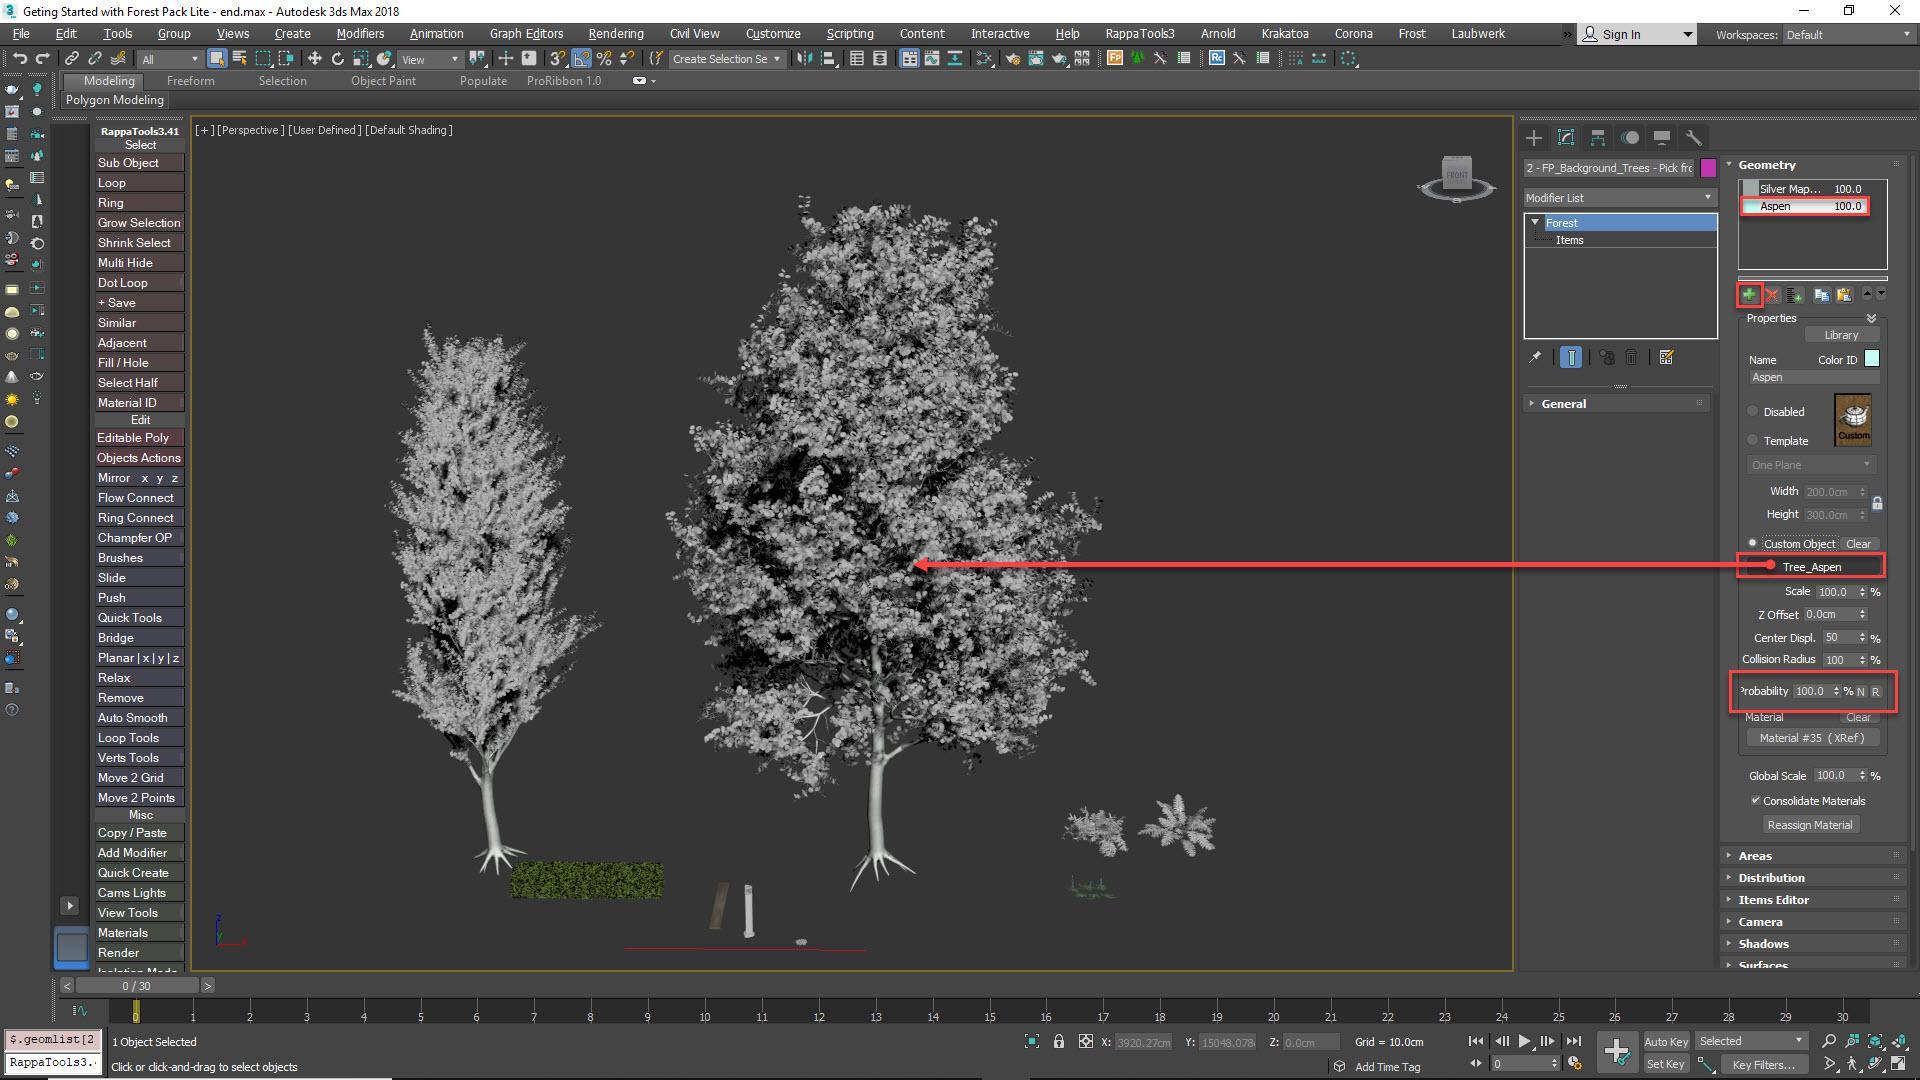 Adding trees manually